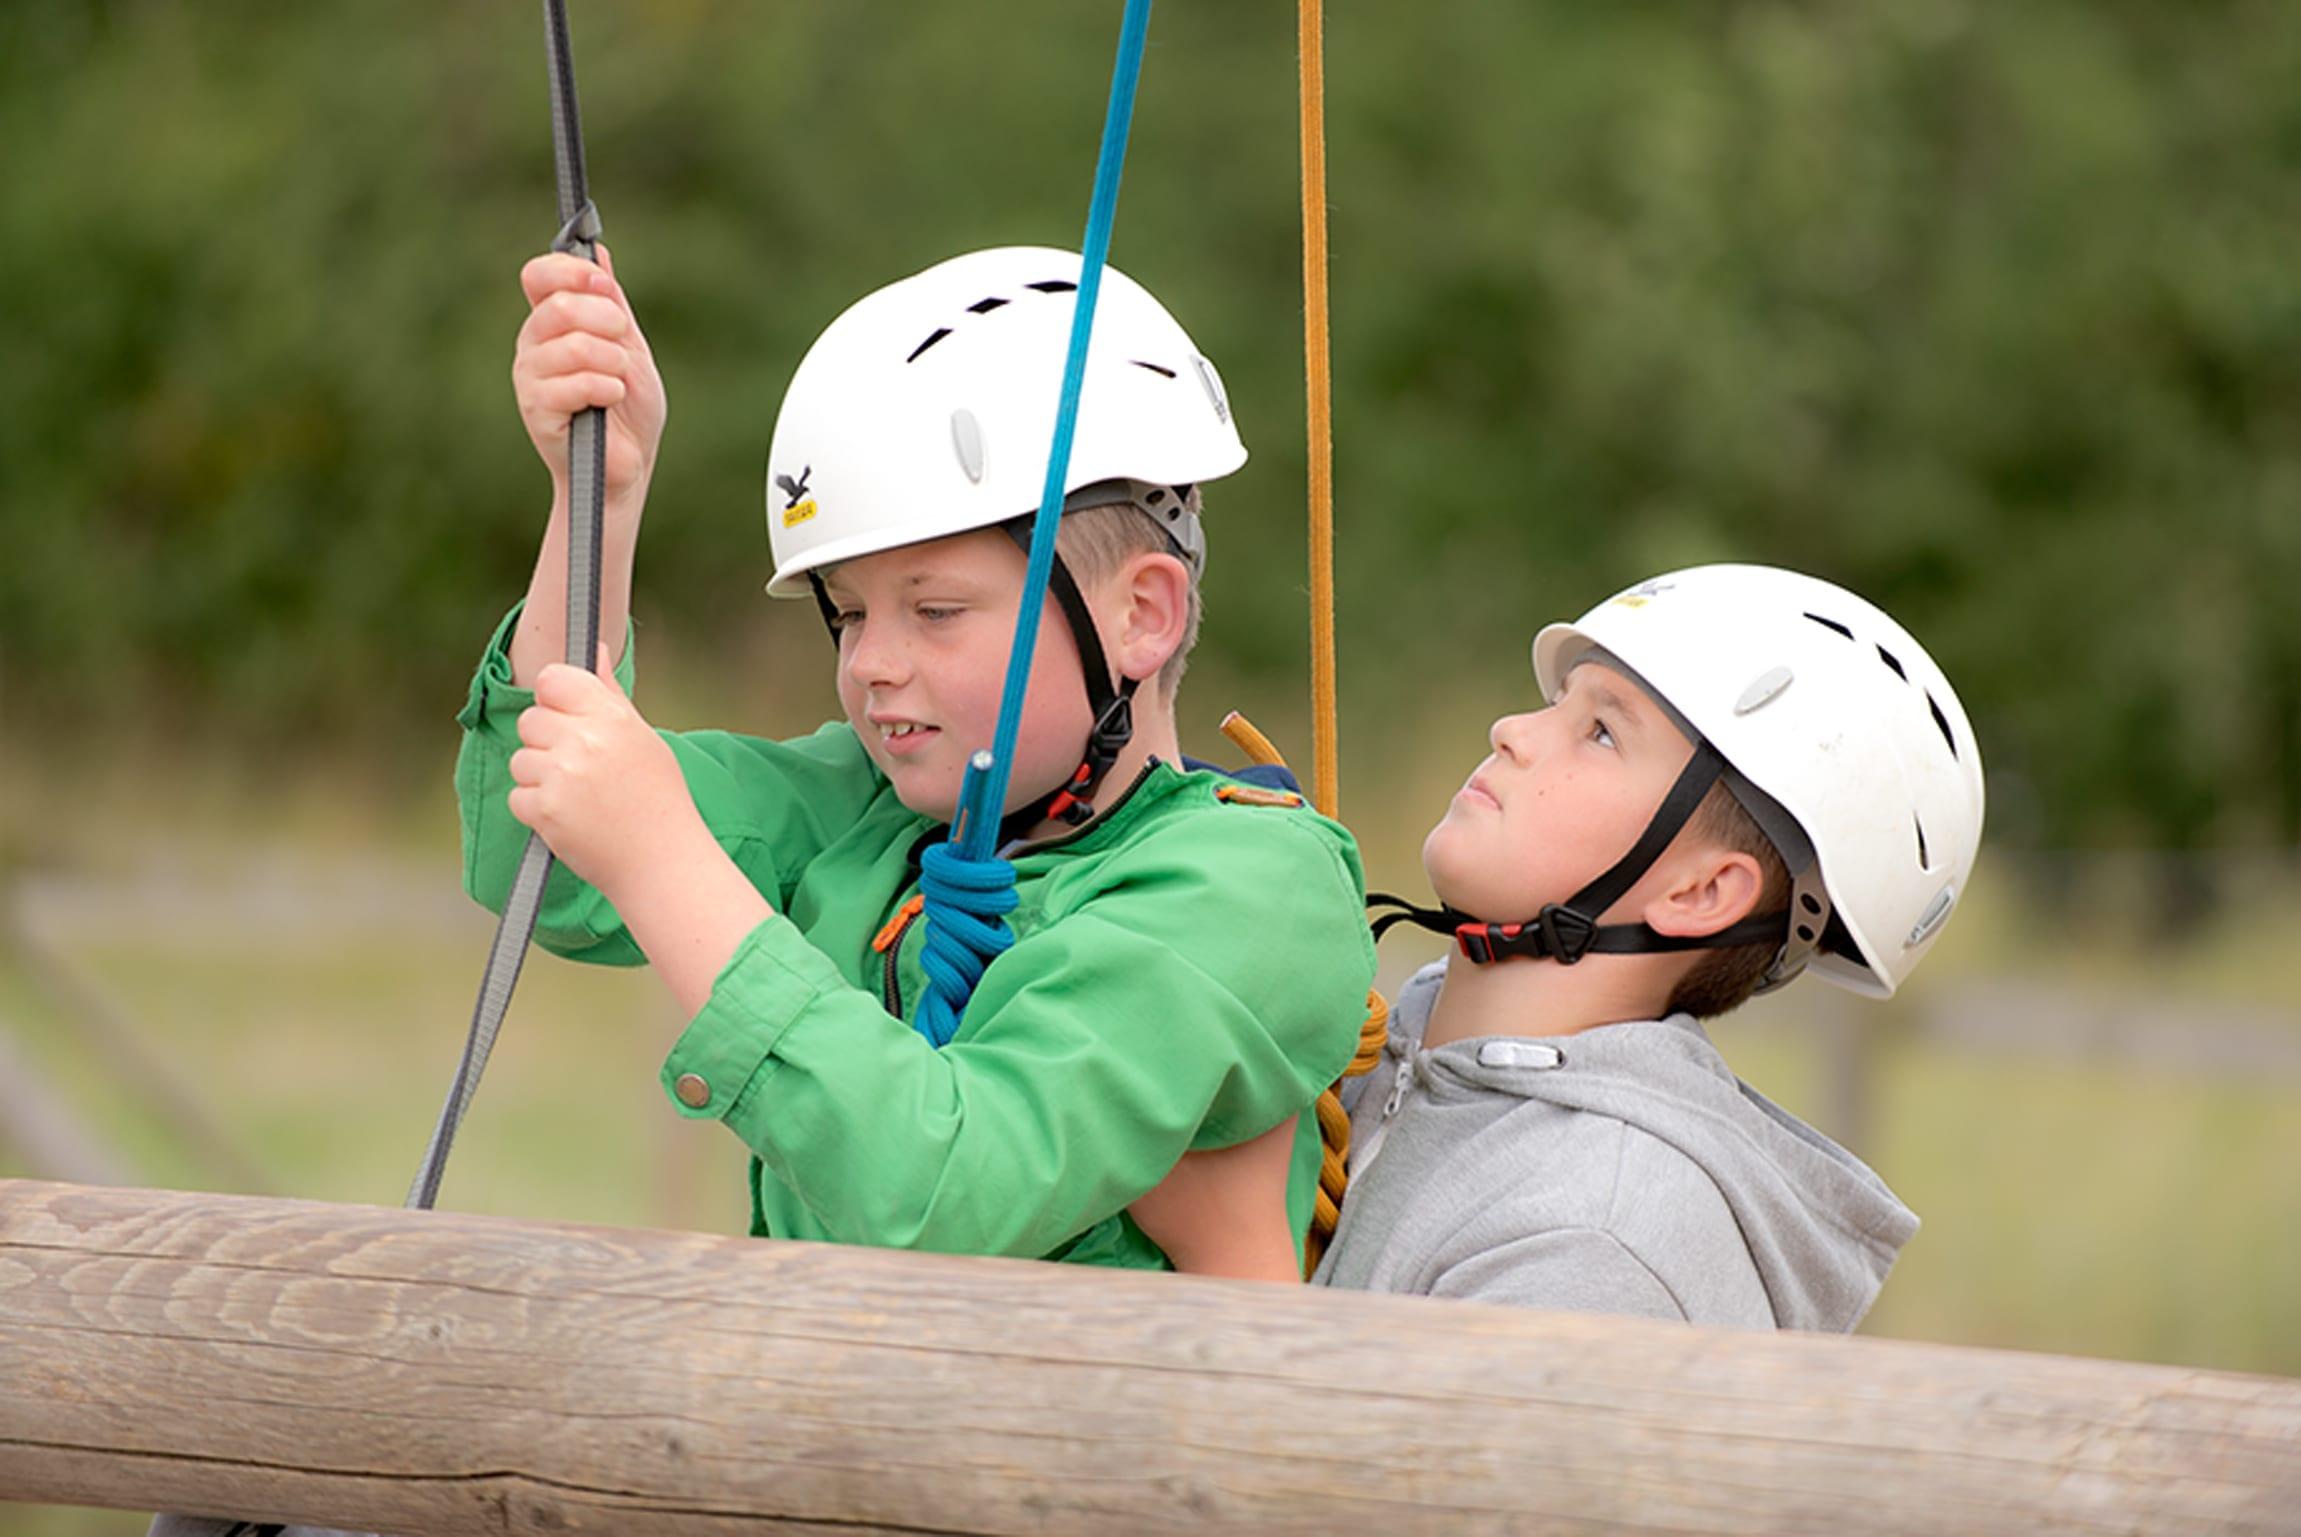 YHA Summer Camps - Rope Climbing